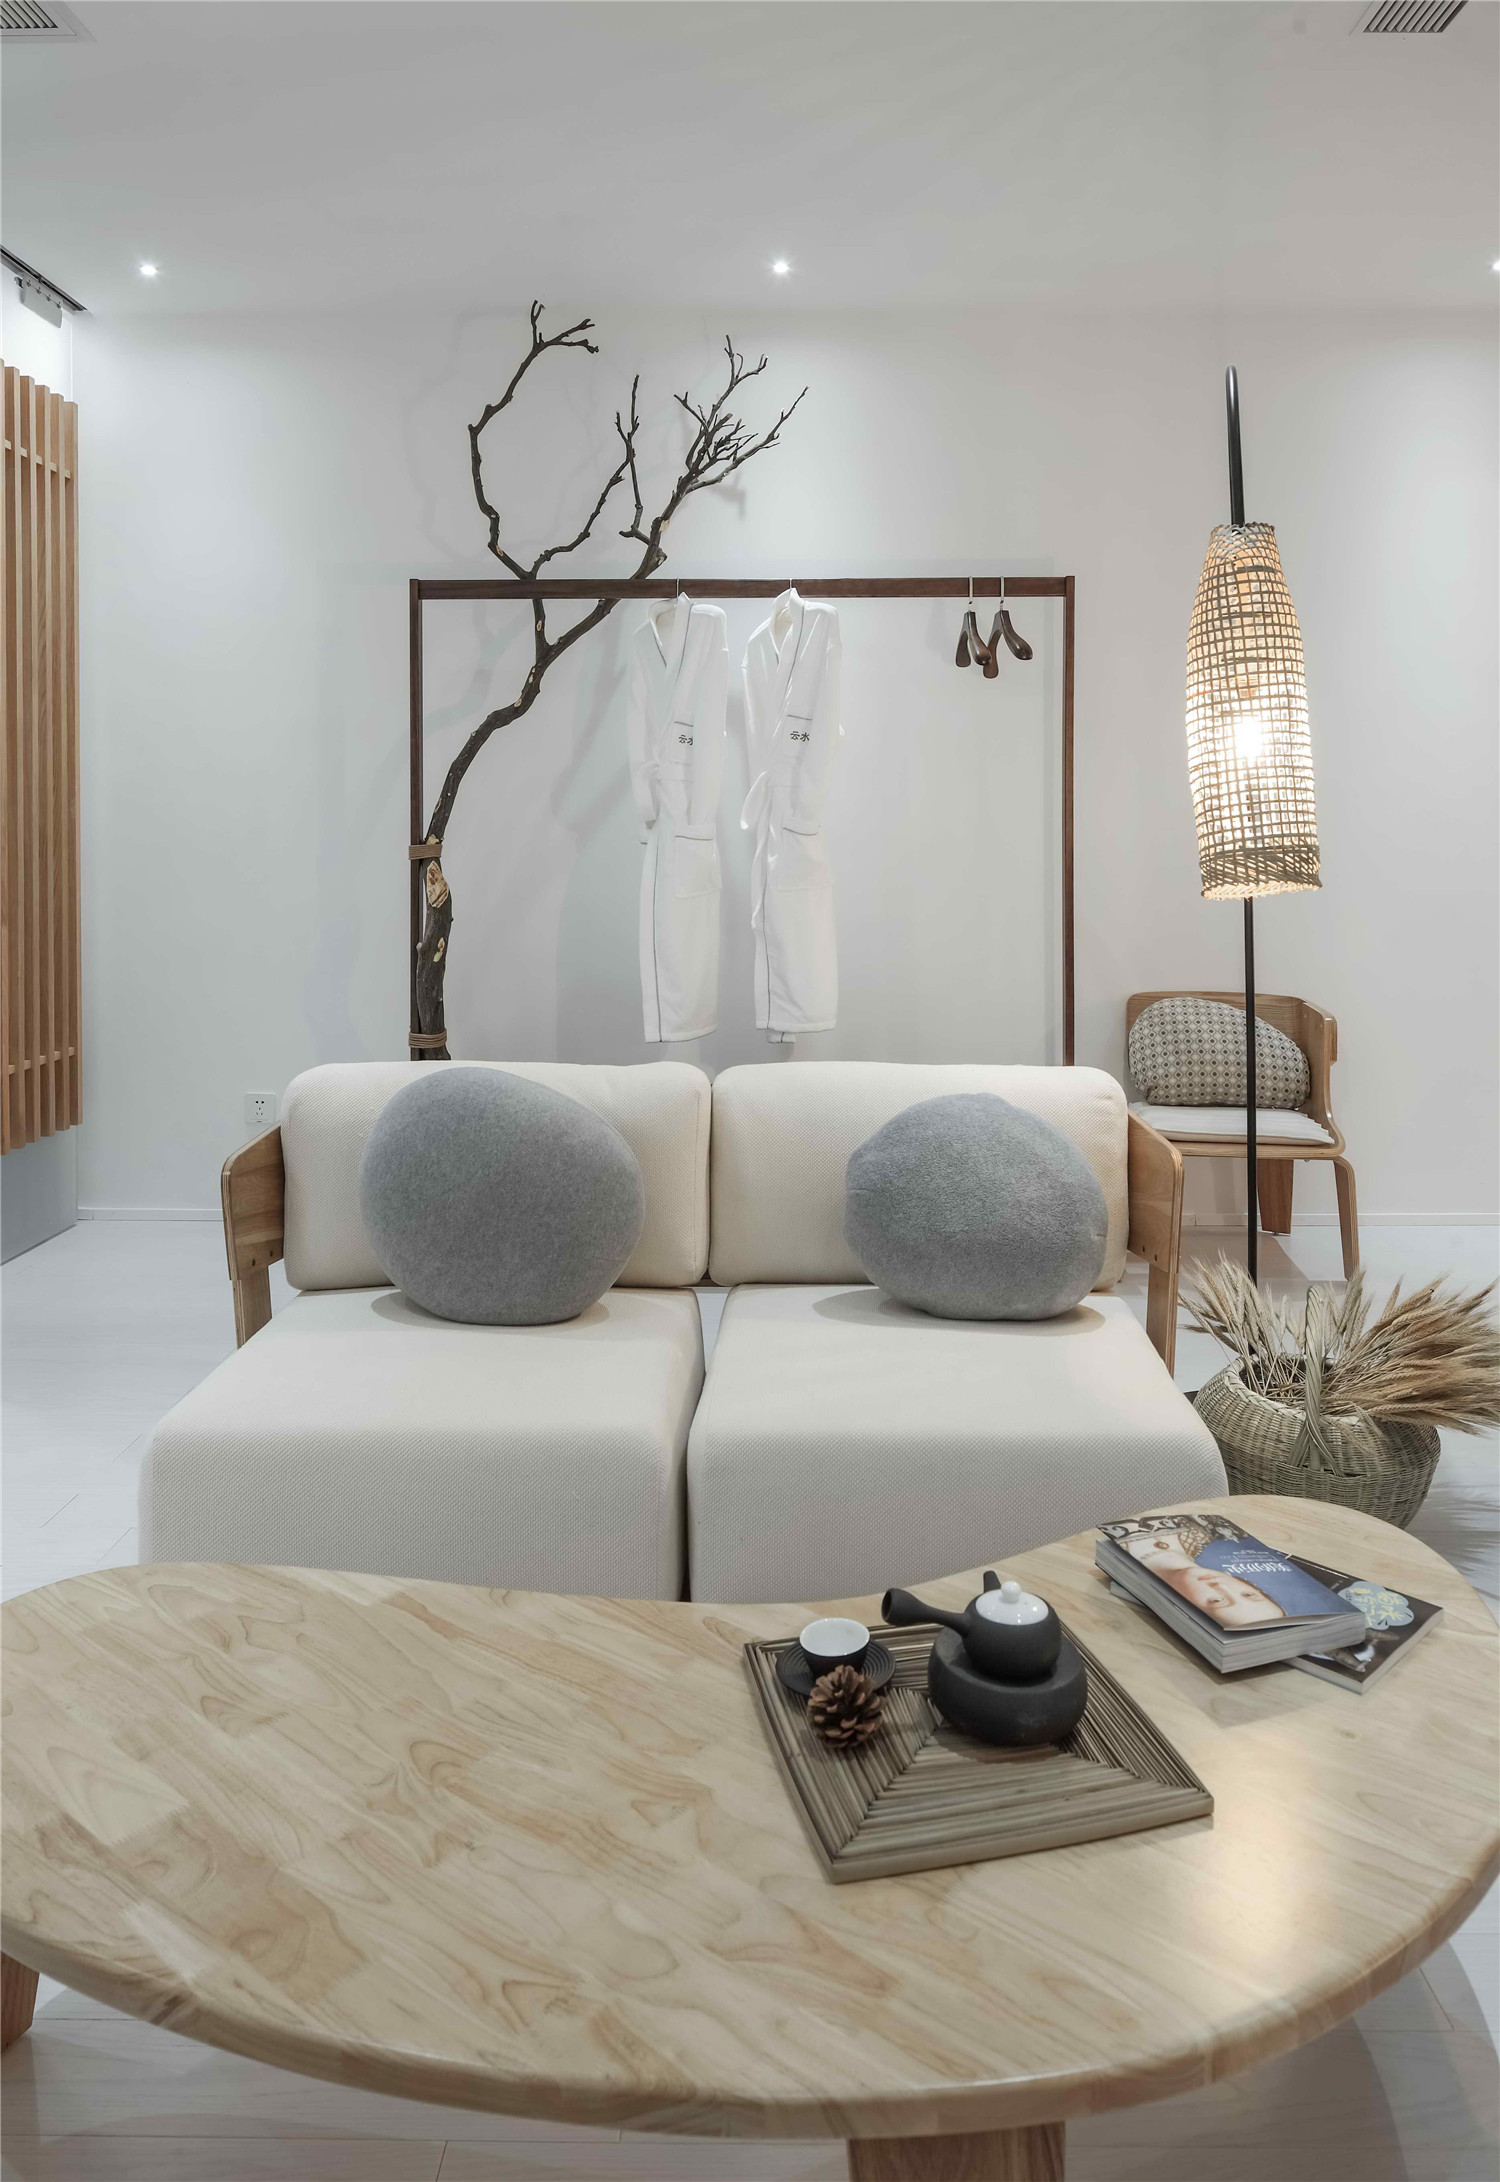 Ripple Hotel - Qiandao Lake design brief Hisheji (59)